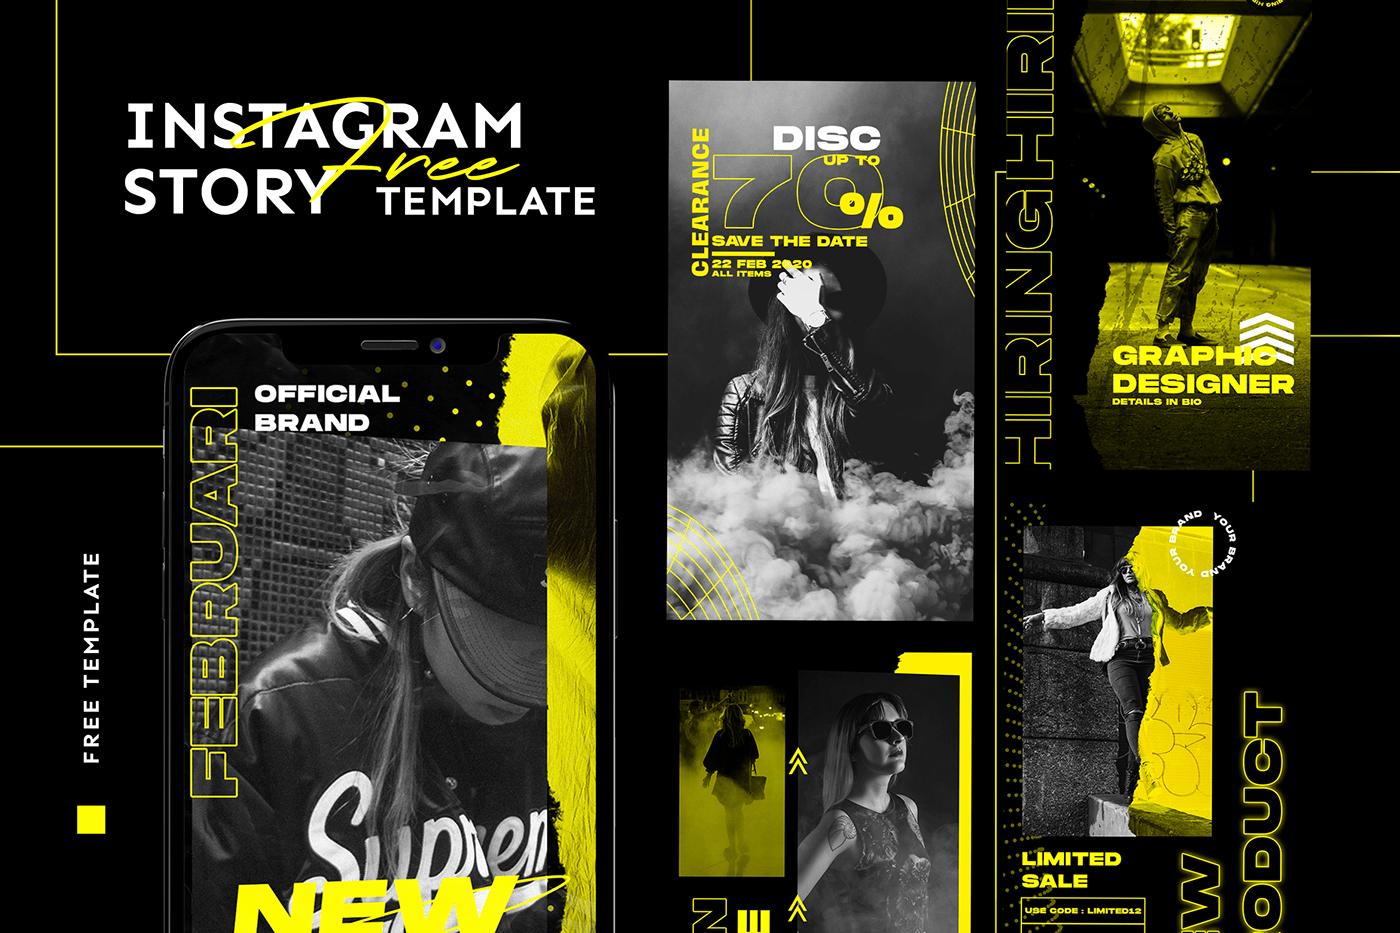 instagram instagram posts Instagram Stories free hypebeast freebie Fashion  free psd Free Template streetwear